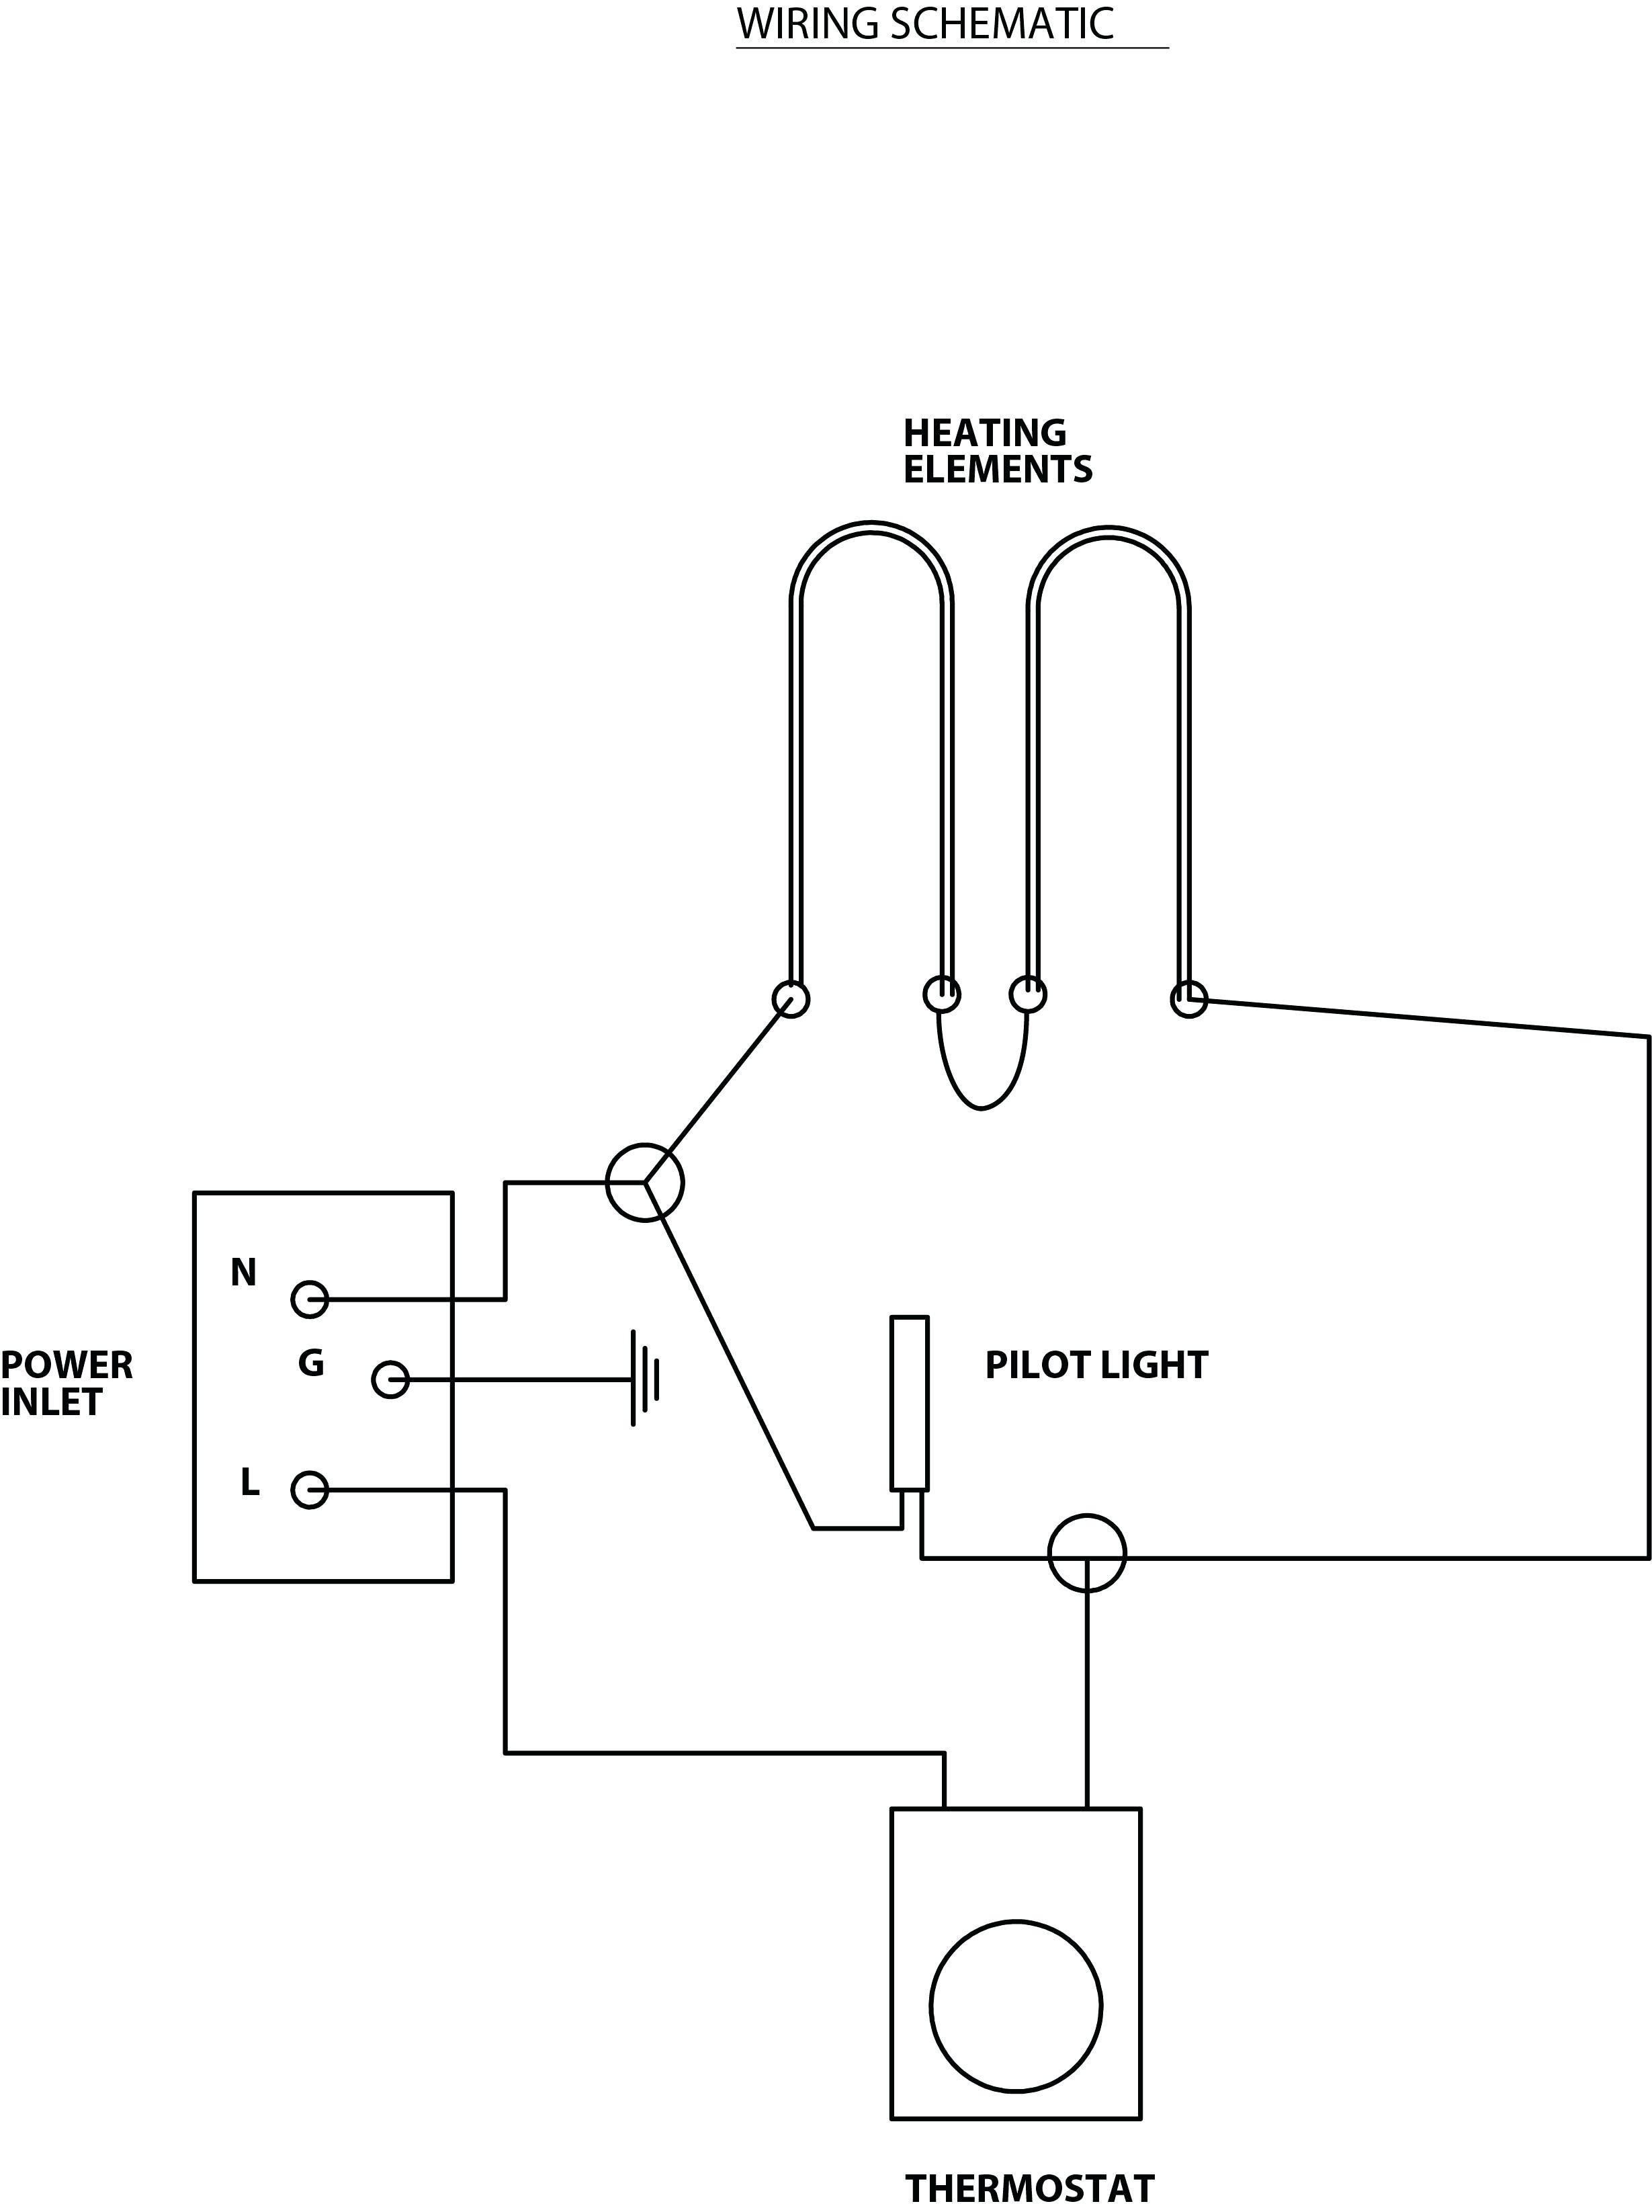 220 Volt Wiring Diagram Collection